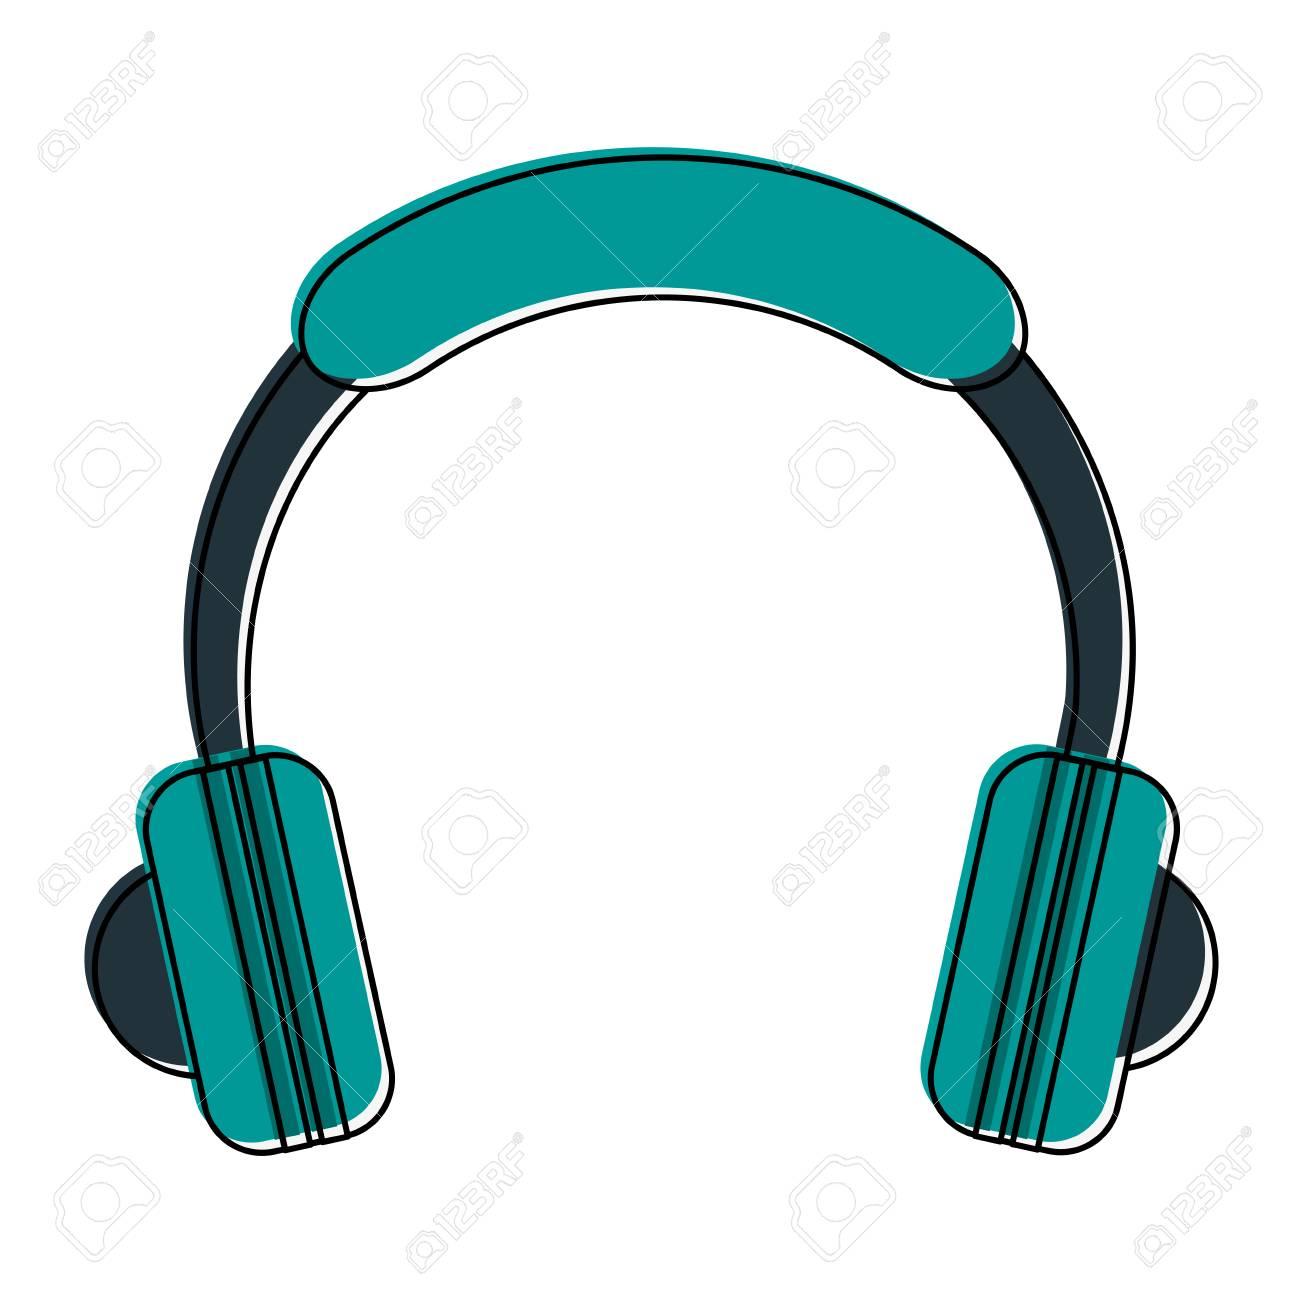 Musik Kopfhörer Gerät Symbol Lizenzfrei Nutzbare Vektorgrafiken ...